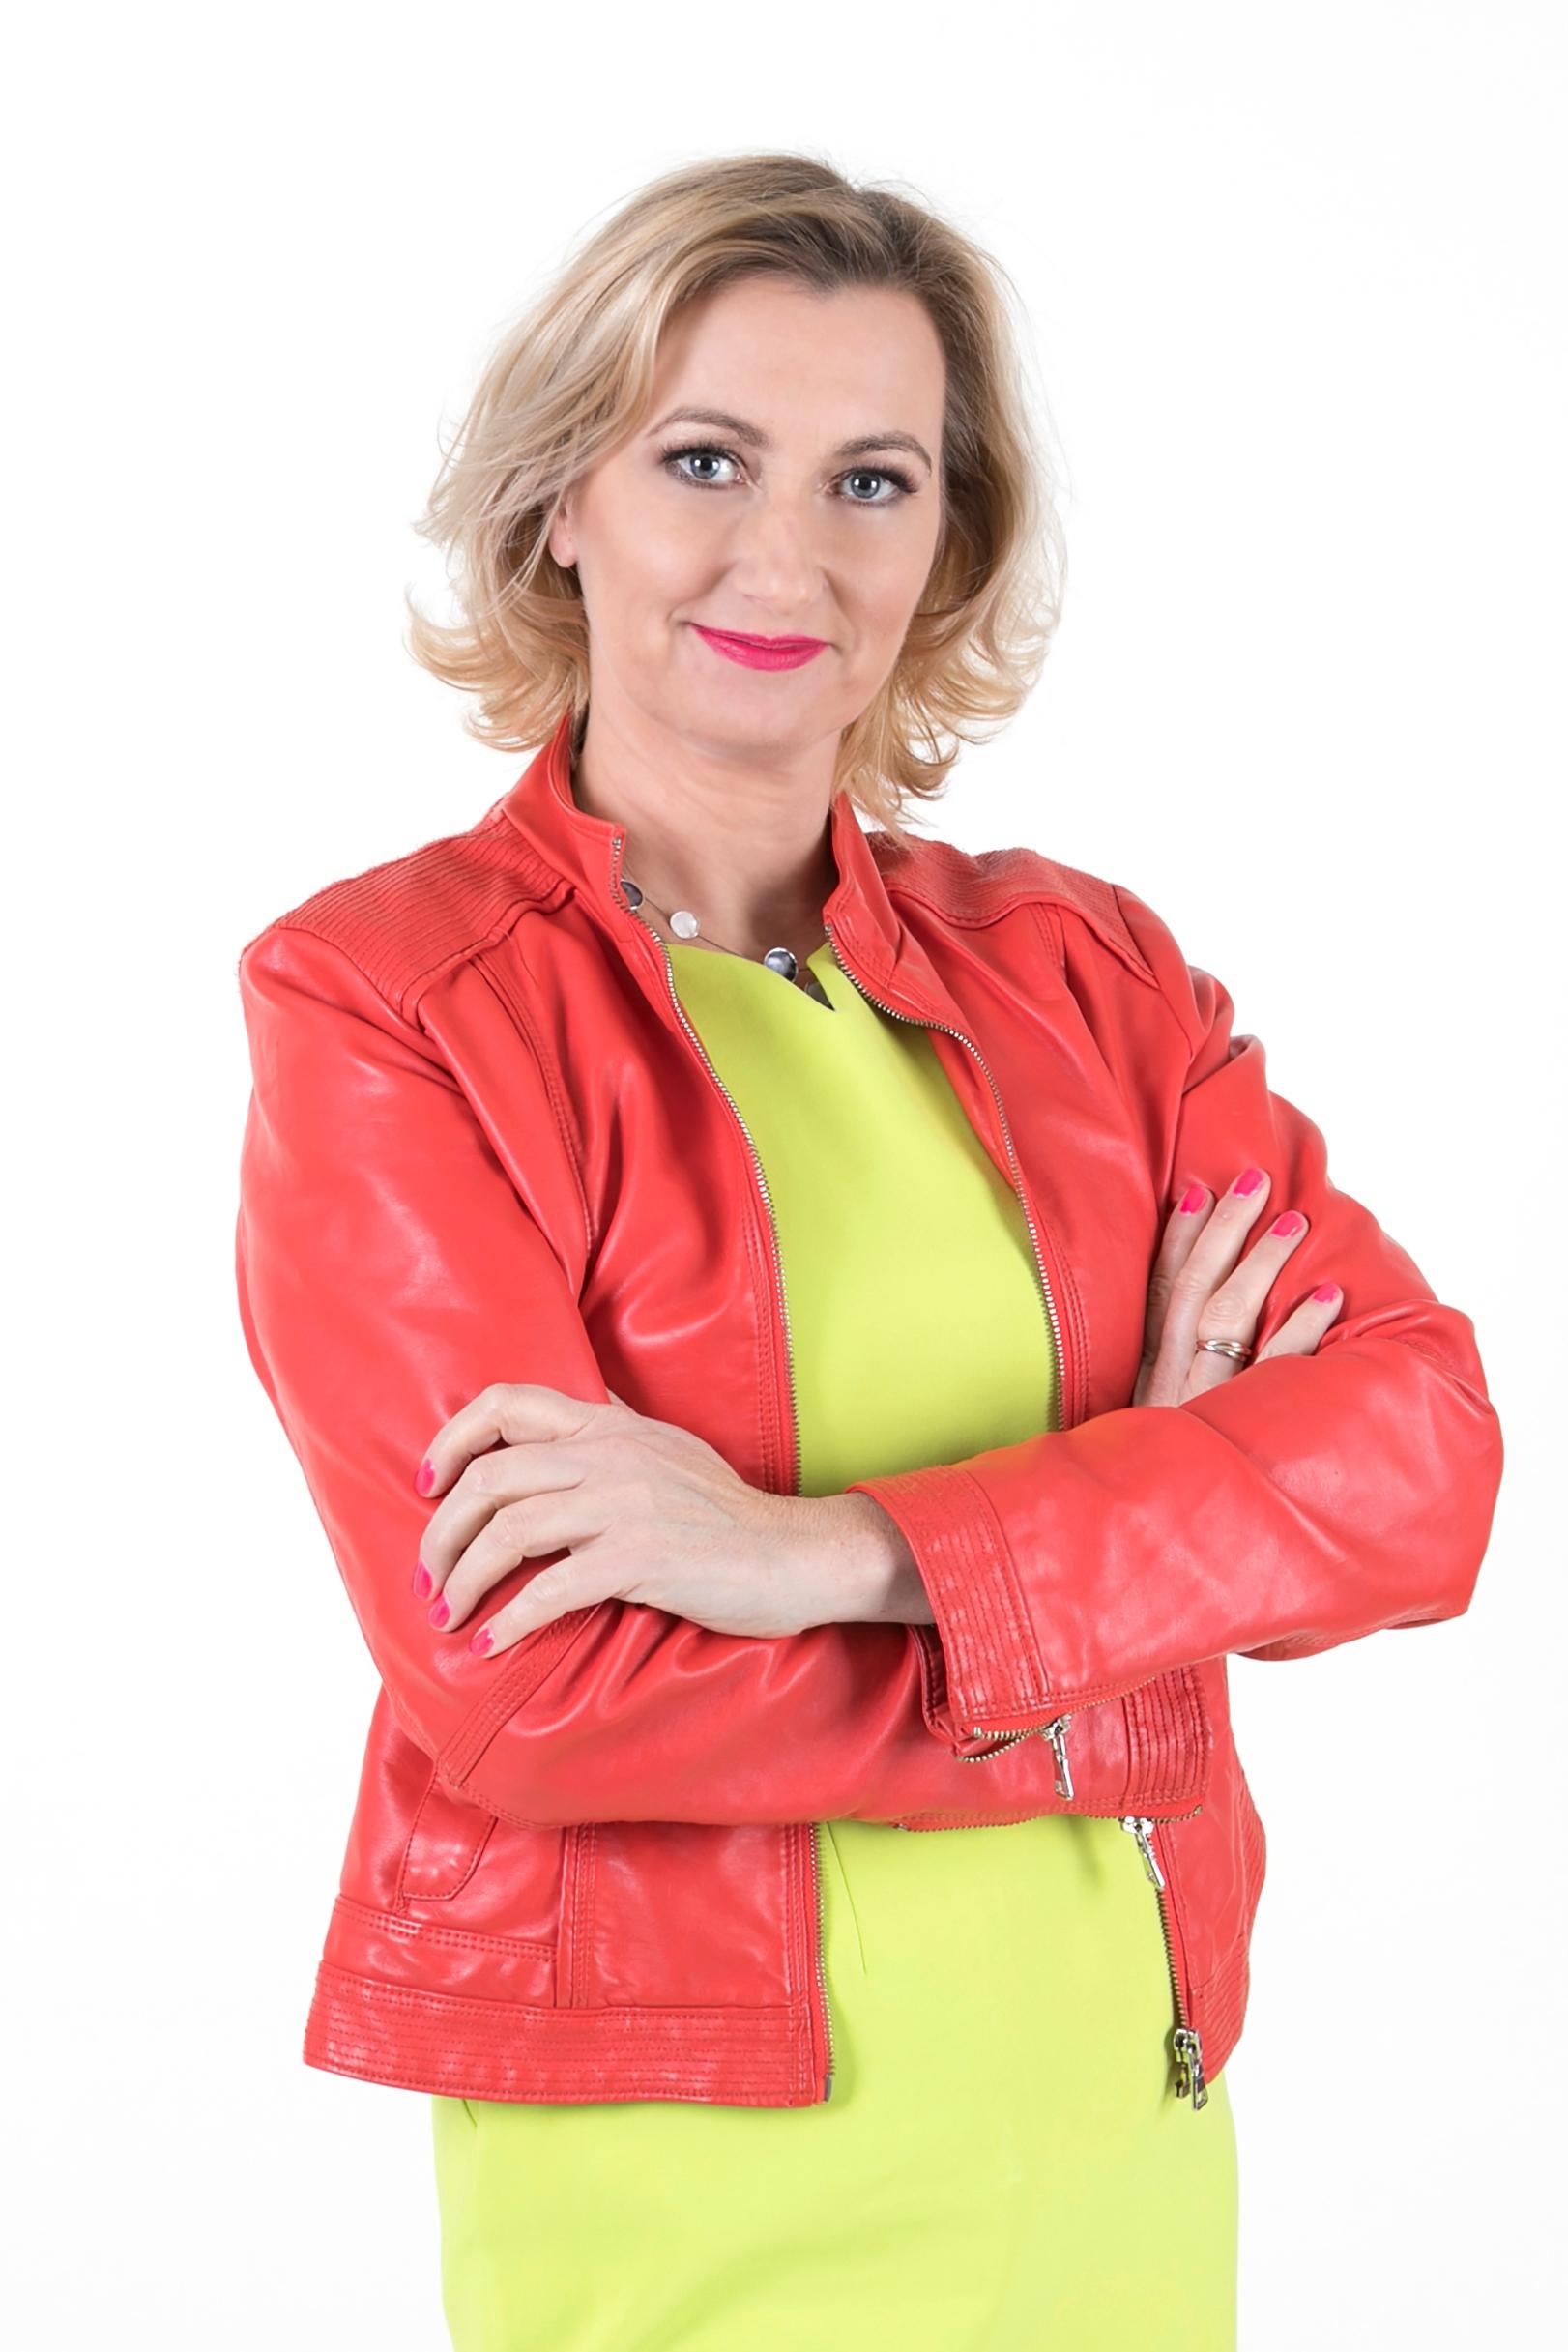 Dorota Jakubowska-Kurzec